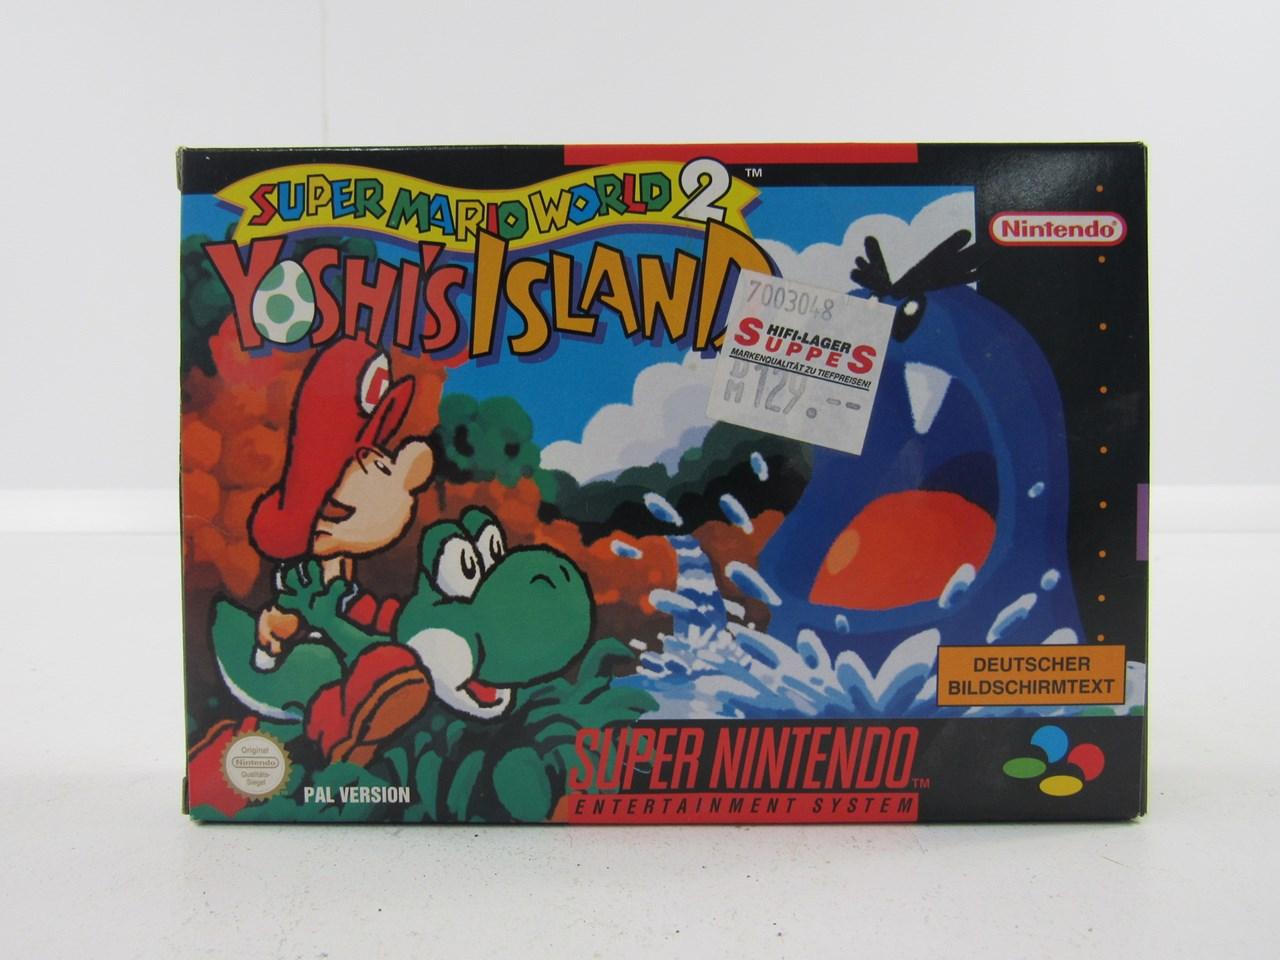 Super Nintendo Super Mario World 2 Yoshis Island Online Kaufen